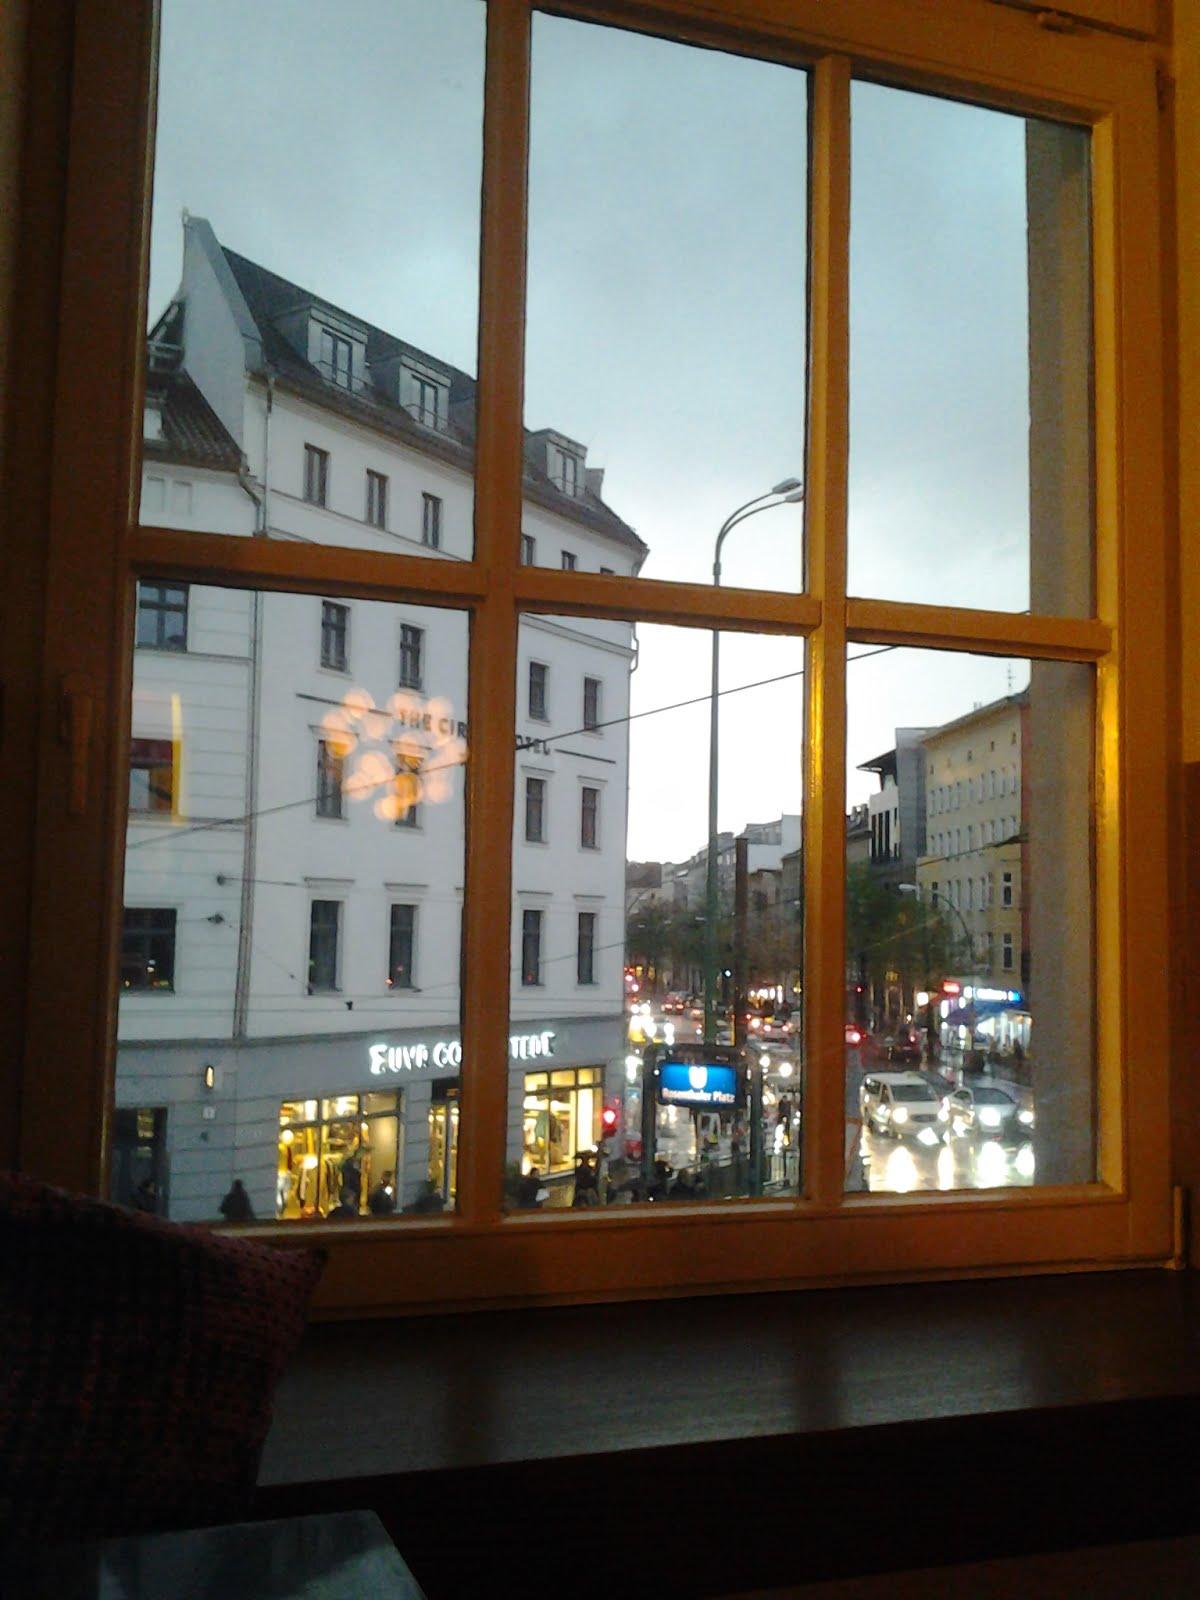 Café St. Oberholz, Berlin